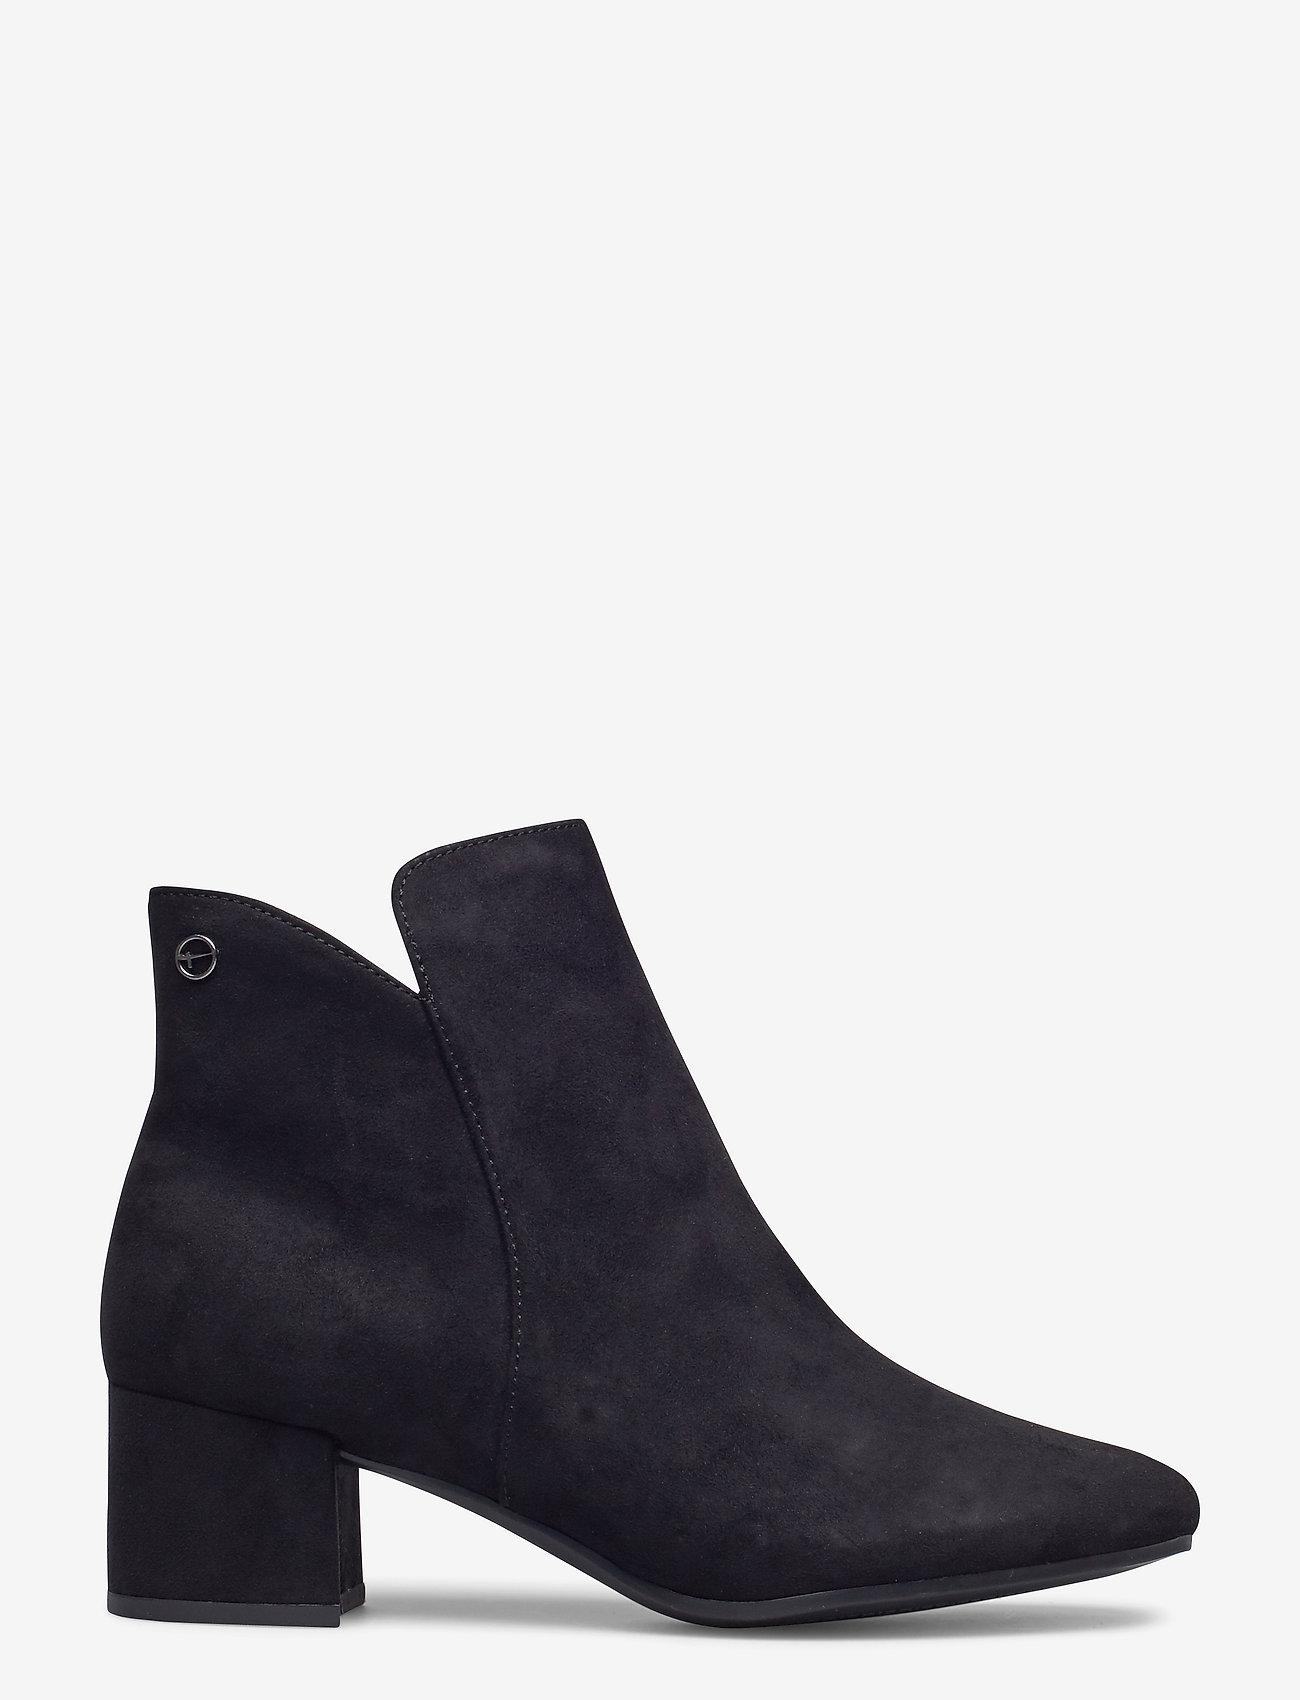 Tamaris - Woms Boots - enkellaarsjes met hak - black - 1